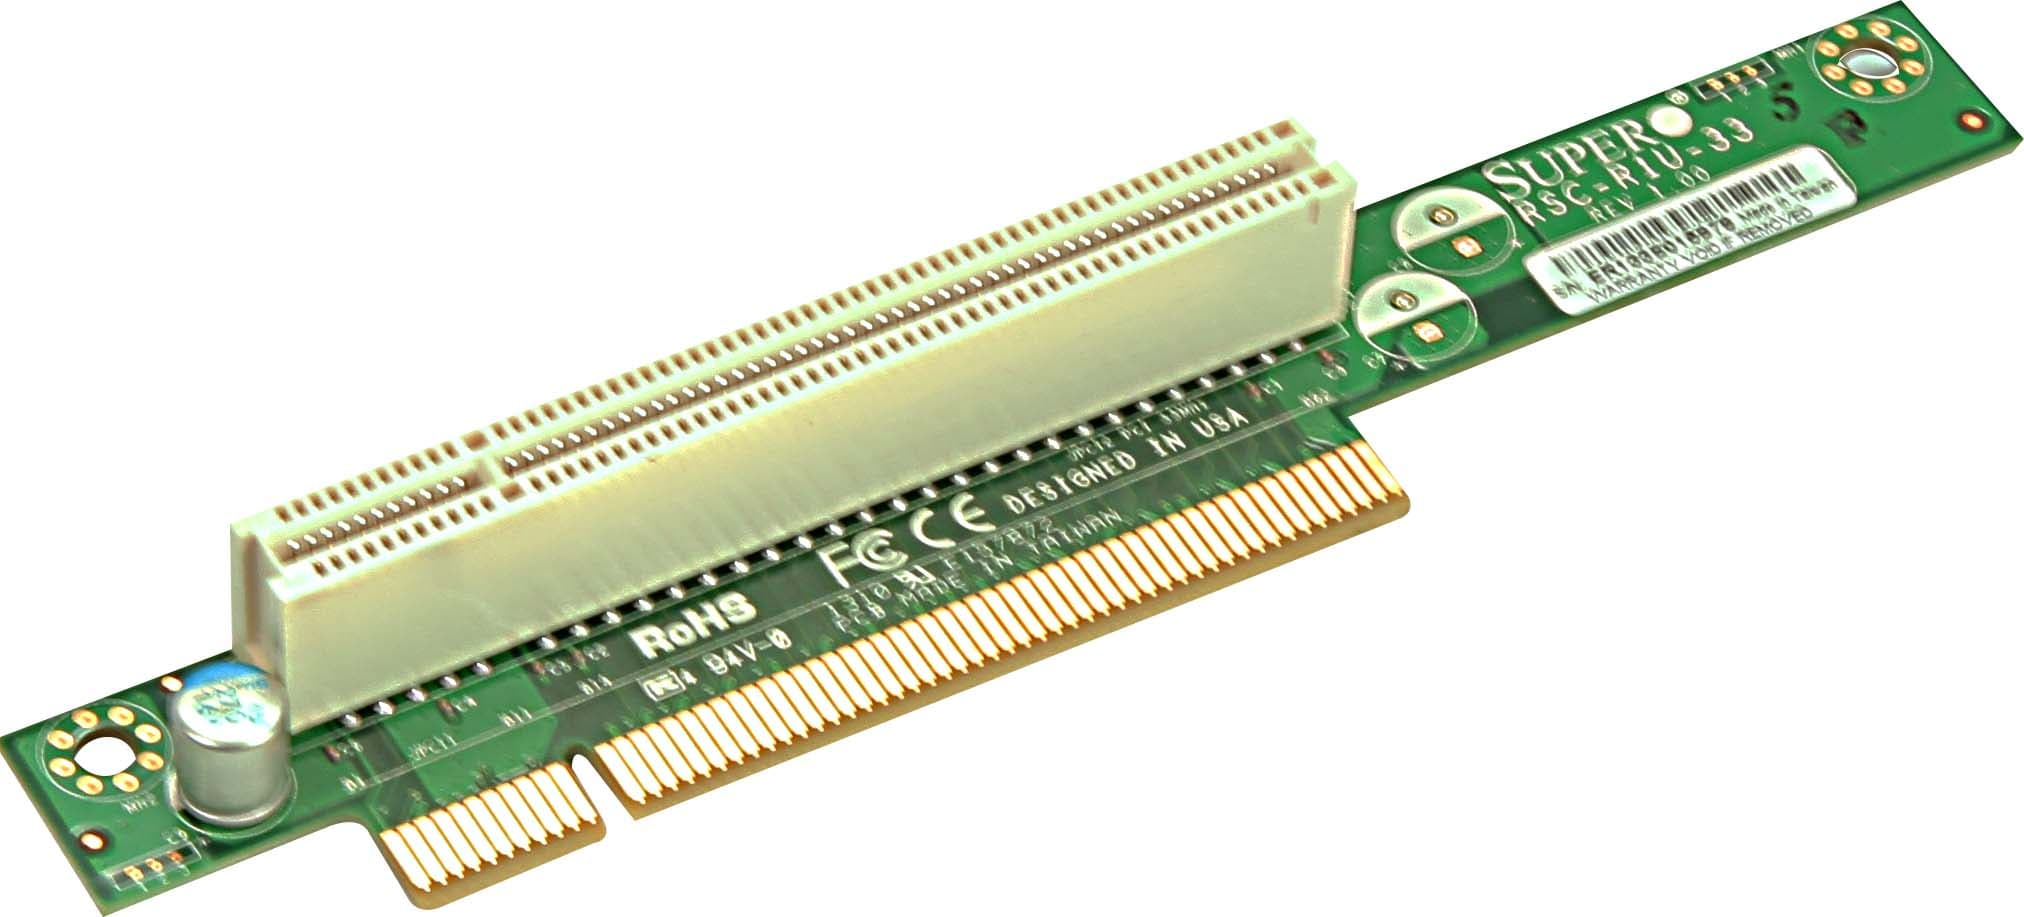 Zdjecie - RSC-R1U-33 - Supermicro